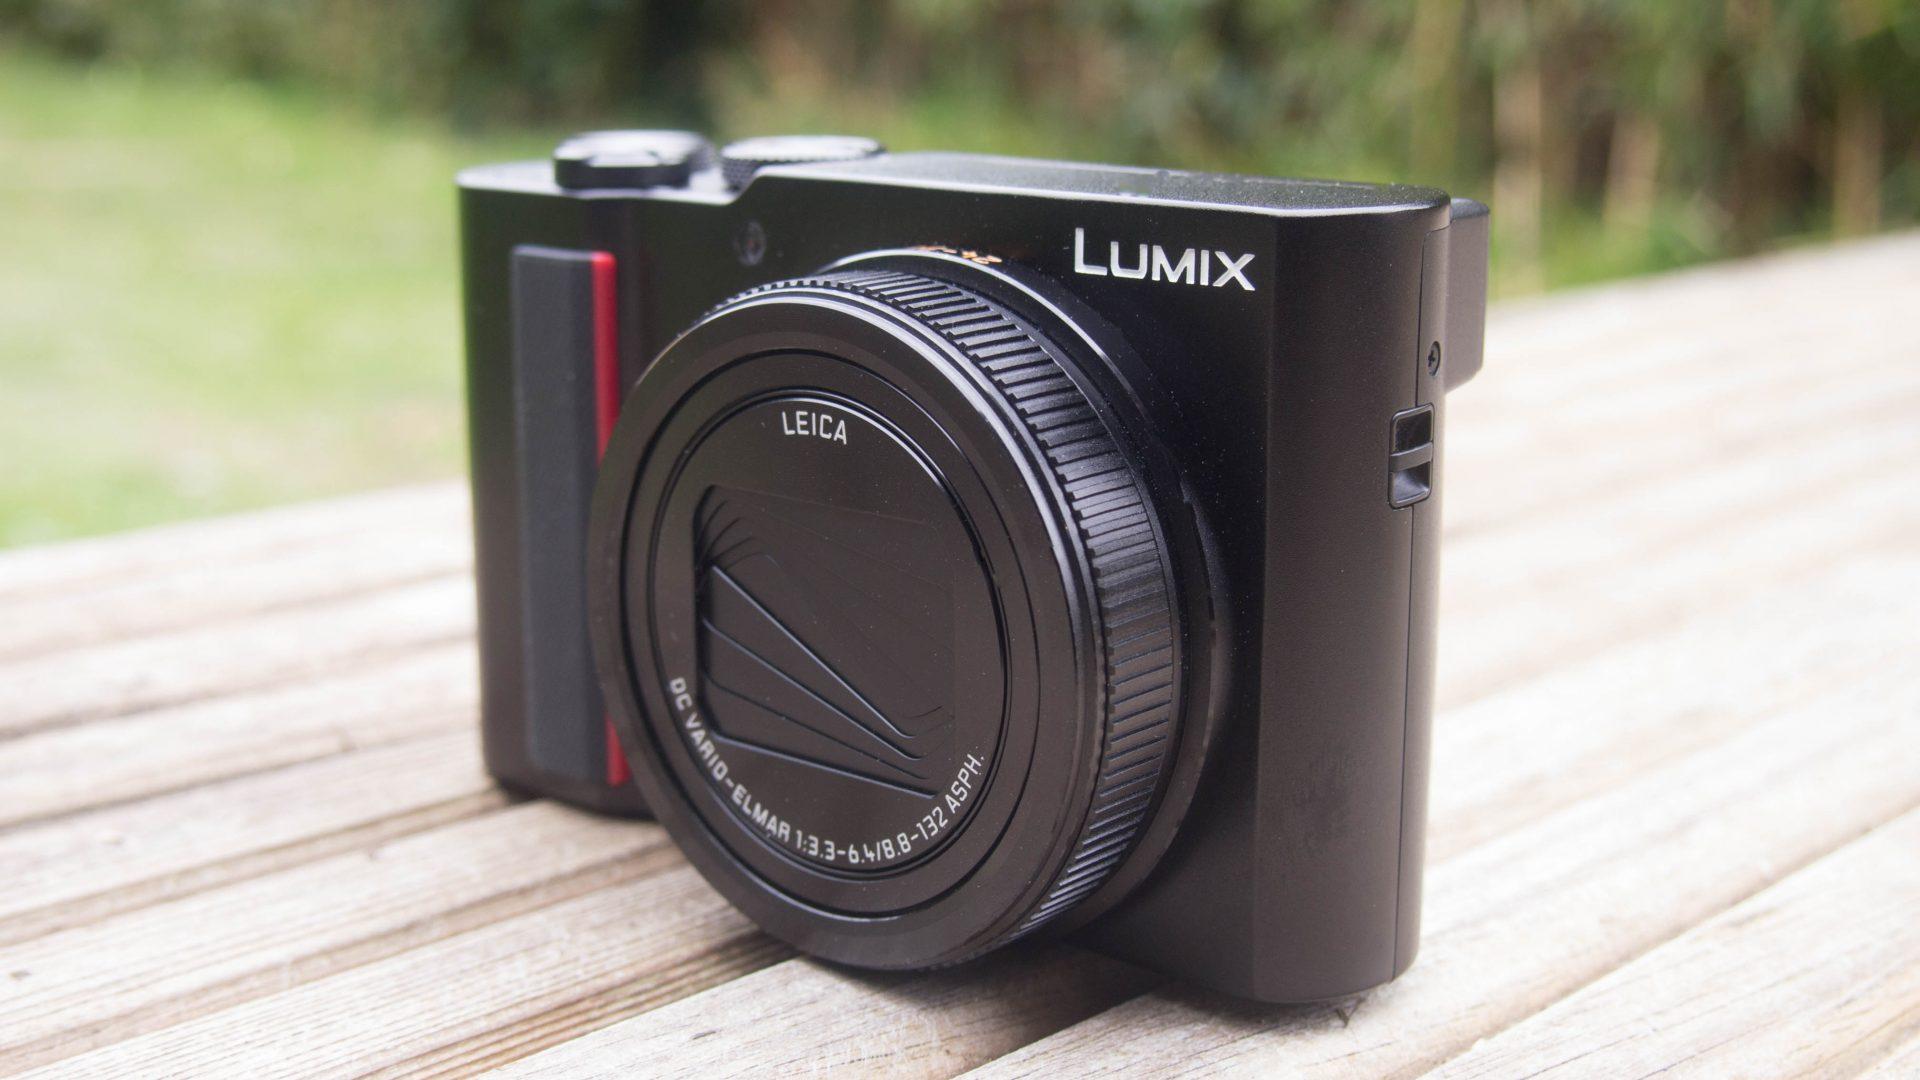 Lumix TZ200 hero